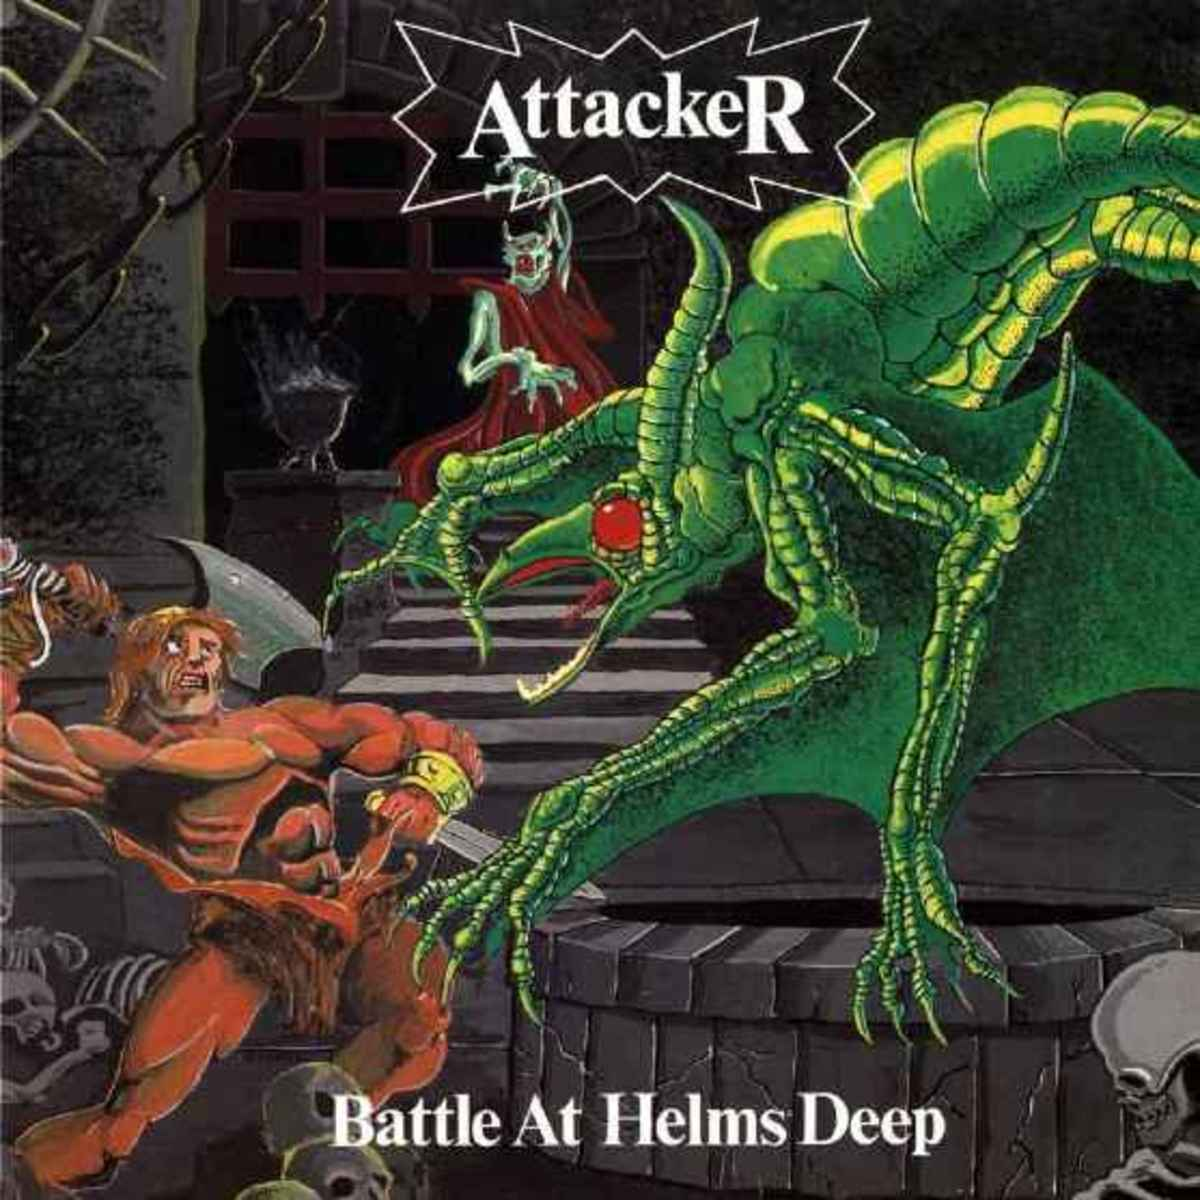 Battle at Helm's Deep (Album Cover)